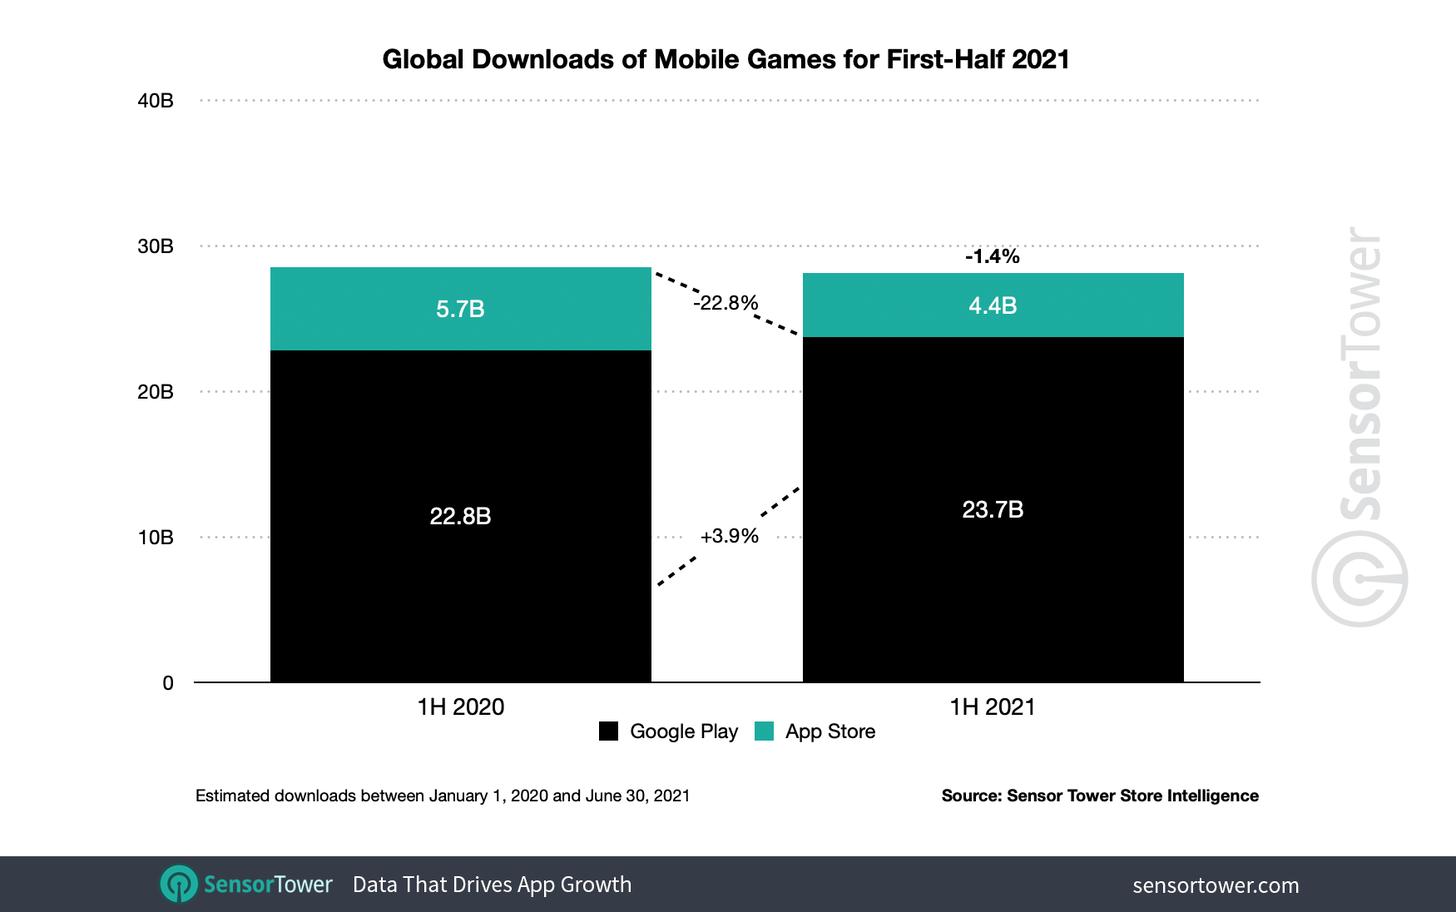 Global game downloads